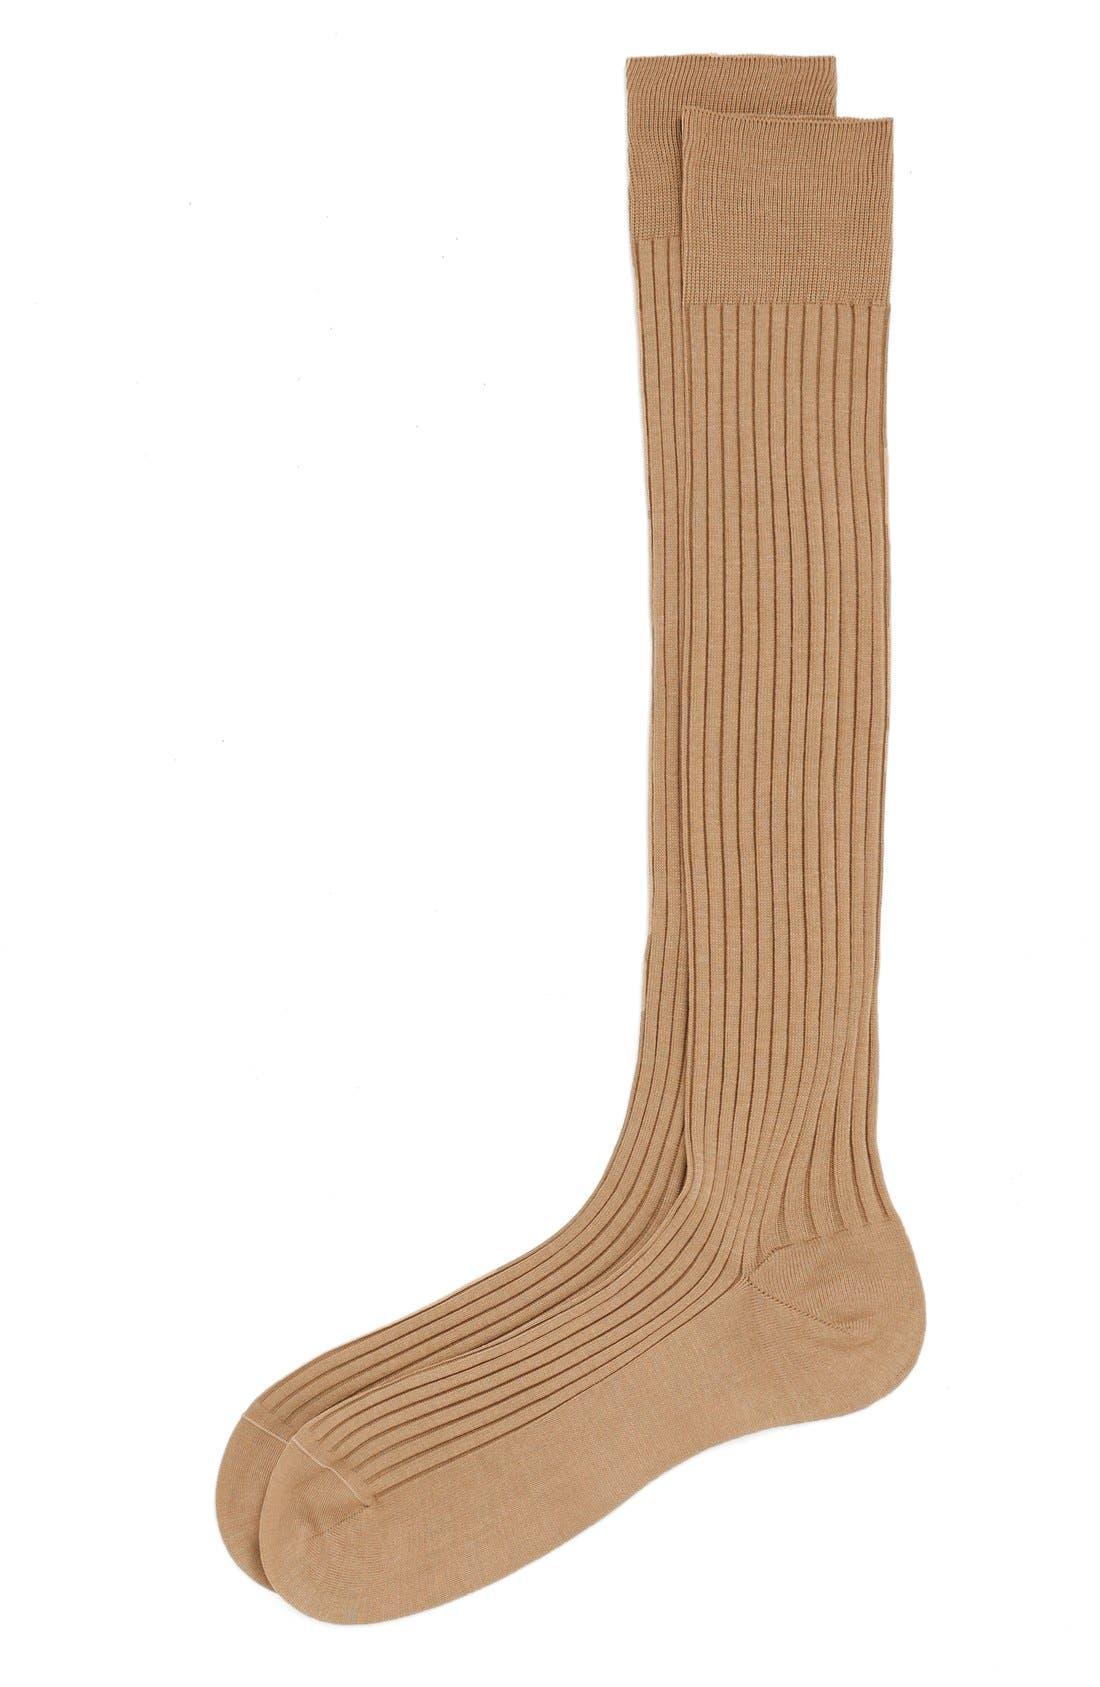 Main Image - Pantherella Cotton Lisle Blend Over the Calf Socks